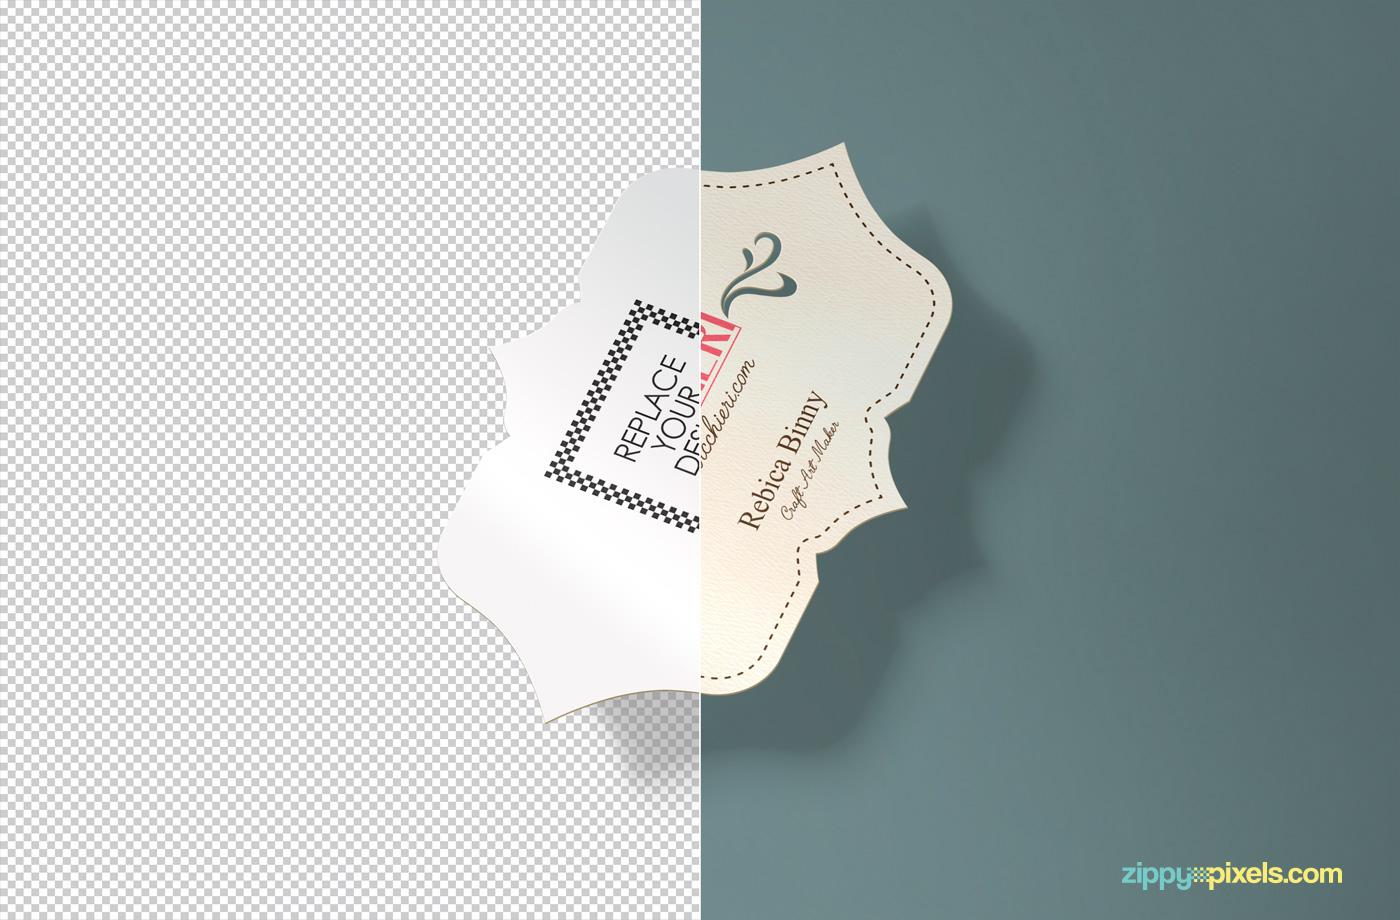 Free Creative Business Card Mockup on Behance